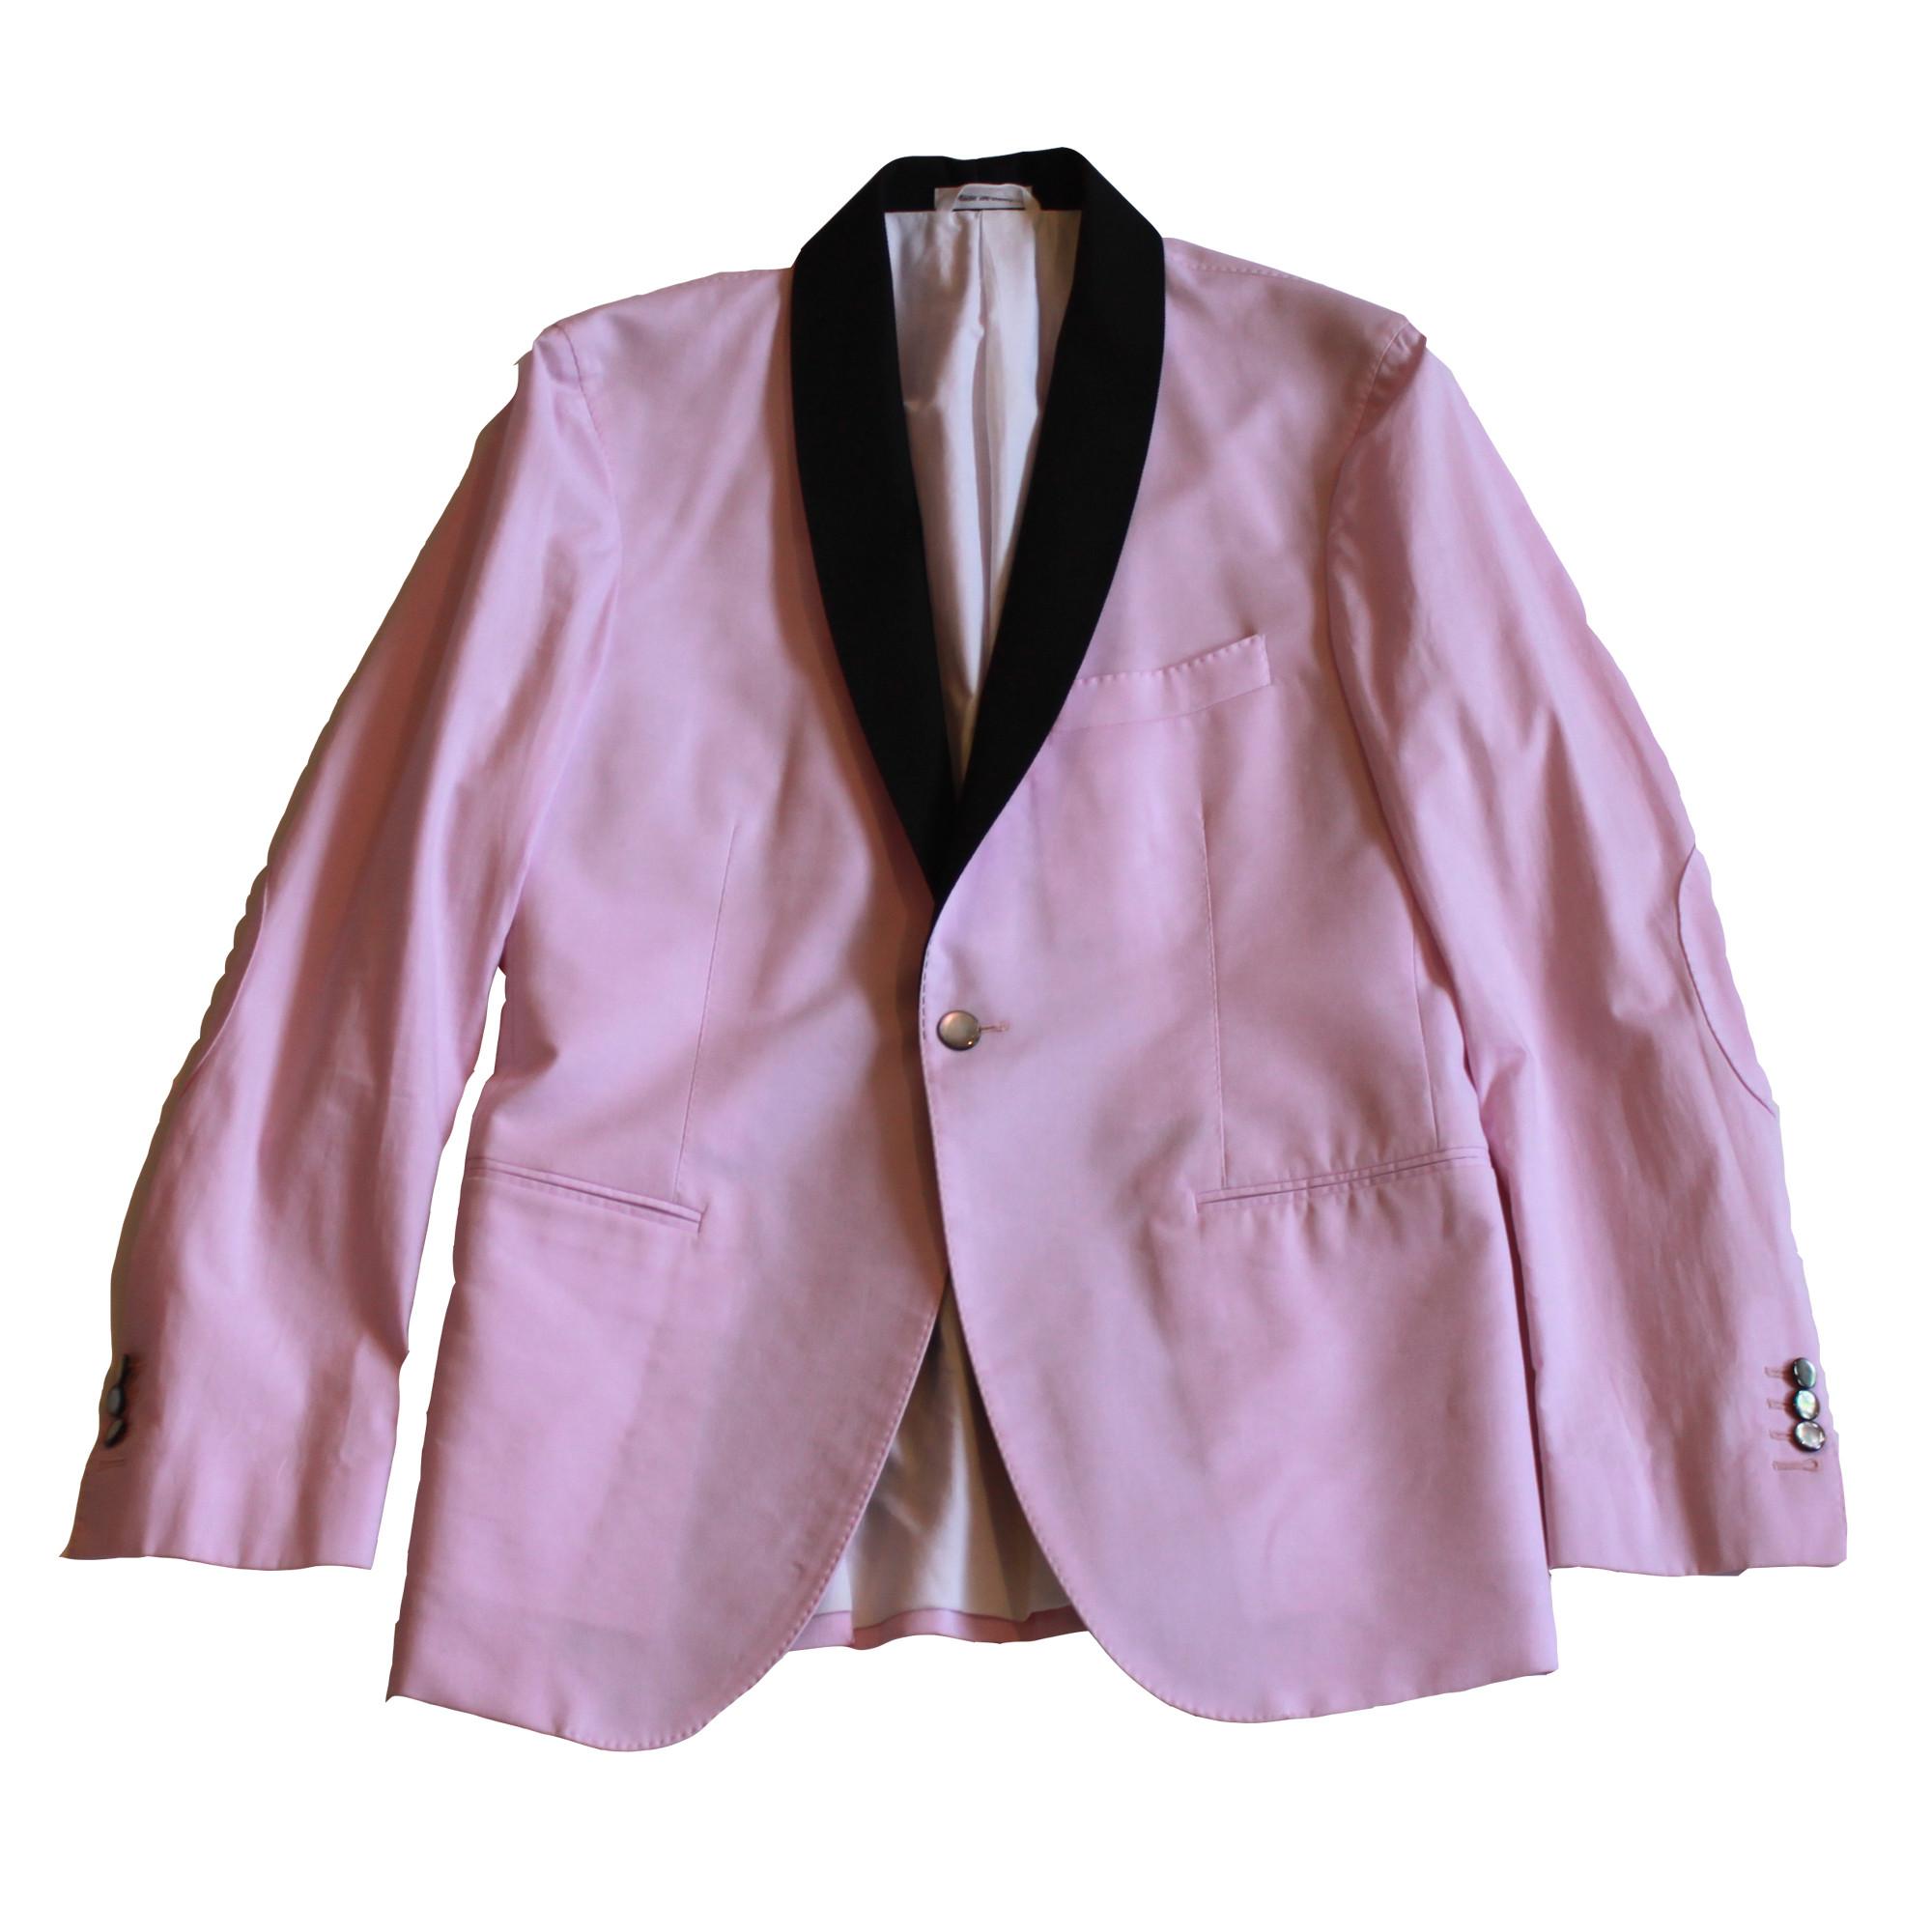 Michael Bastian Formal Jacket - Pink Oxford